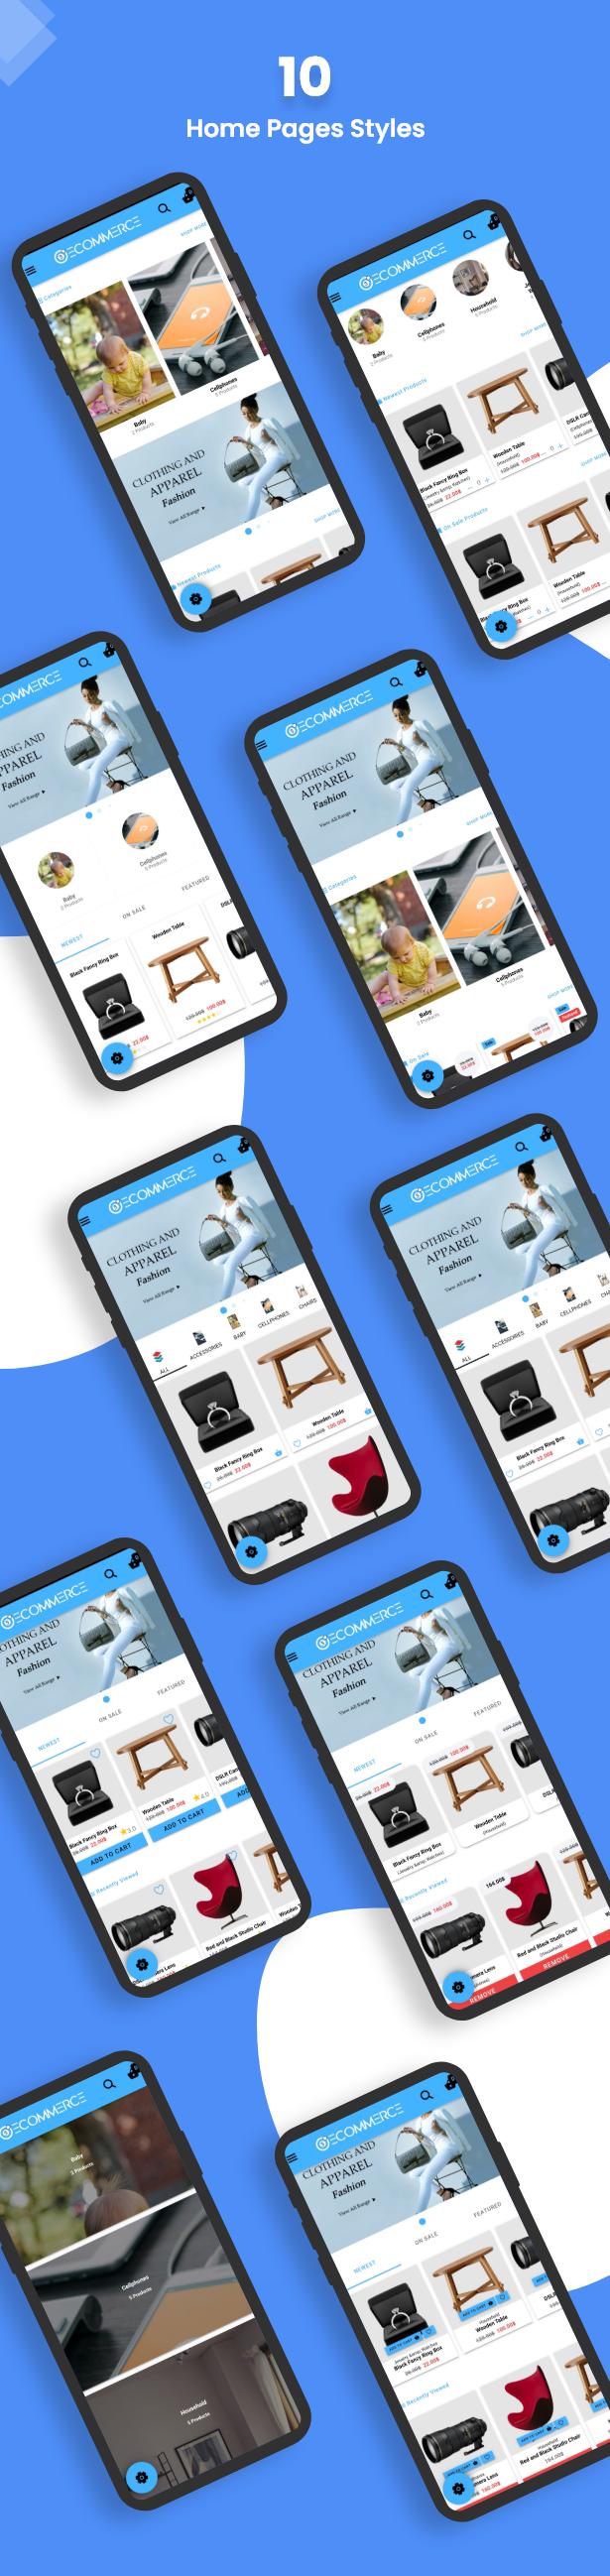 Ionic5 Woocommerce - Ionic5/Angular8 Universal Full Mobile App for iOS & Android / Wordpress Plugins 11